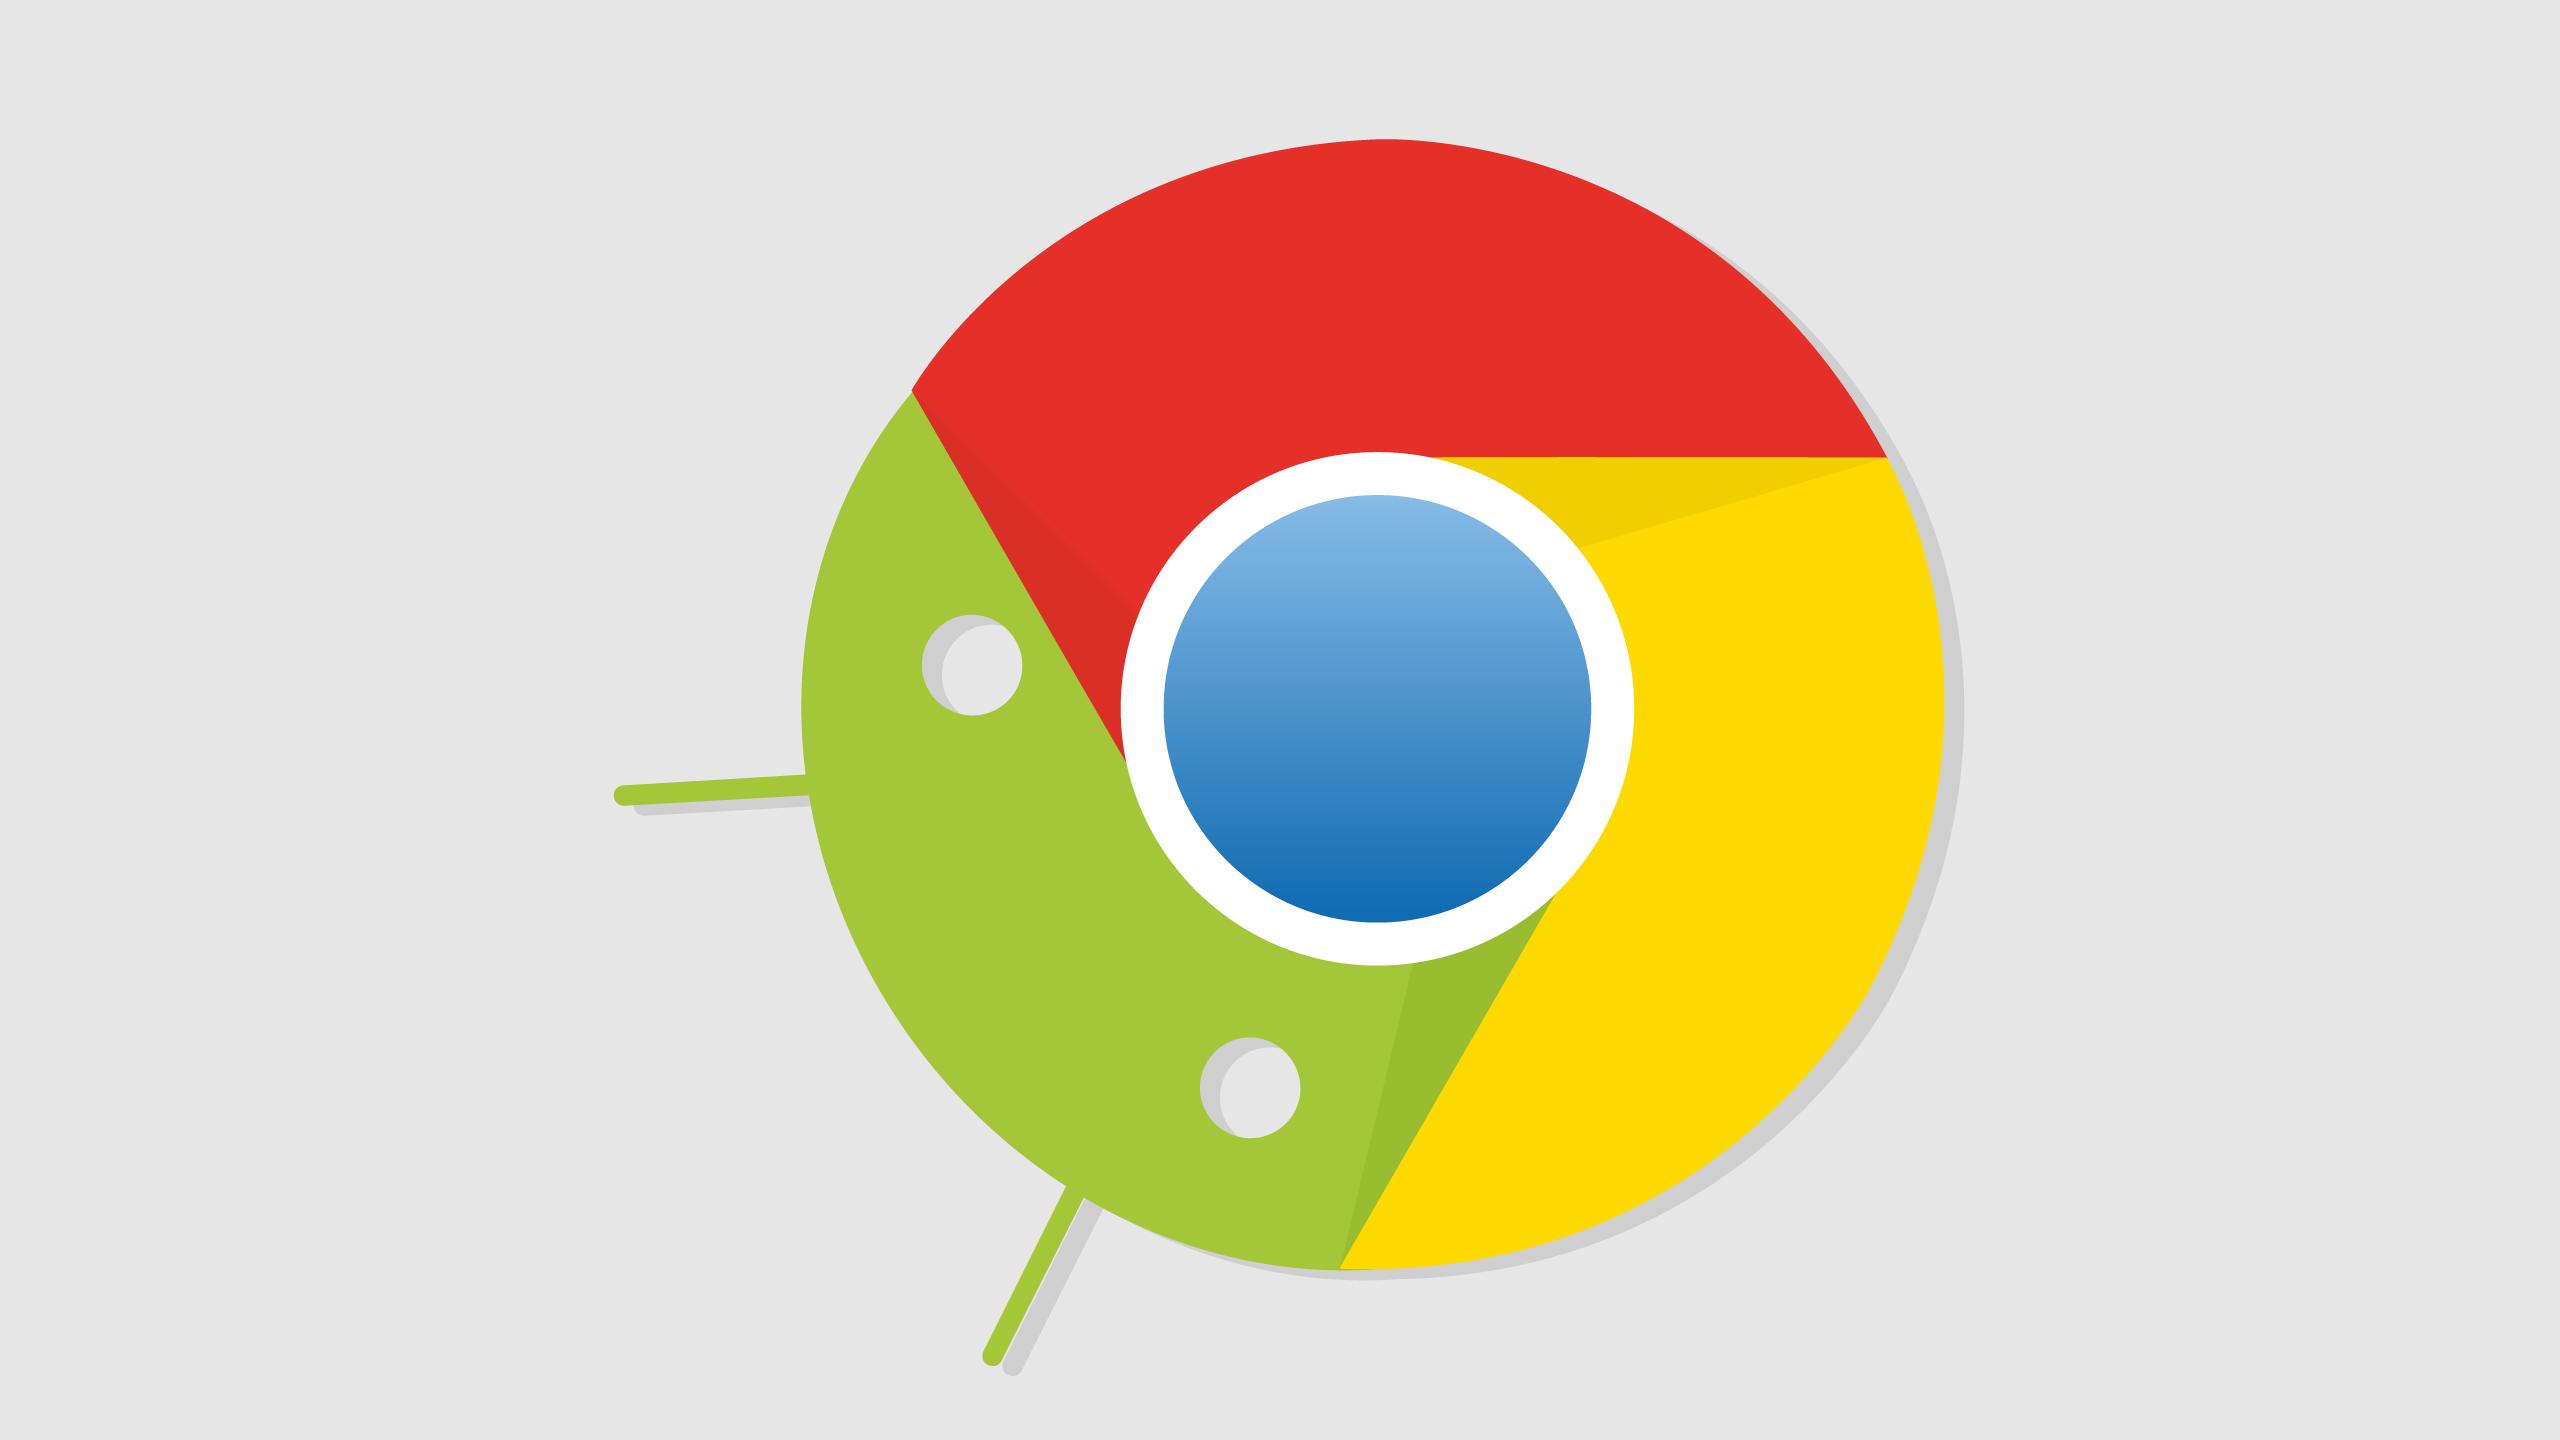 lista de progressive web apps dispon237veis para android